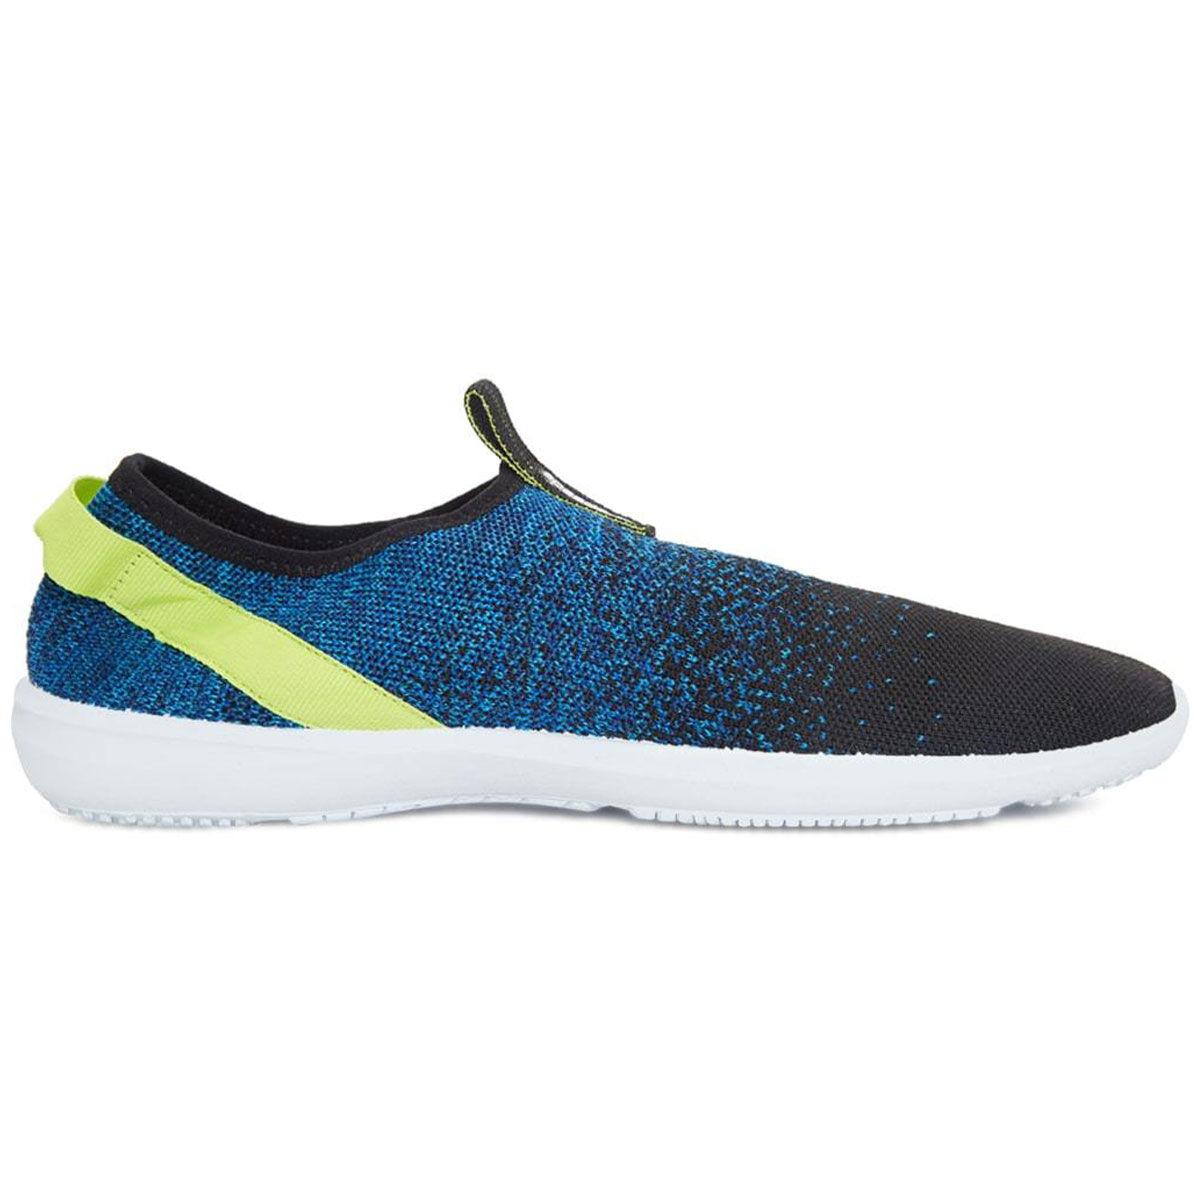 Speedo Surf Knit Pro Shoes for Men